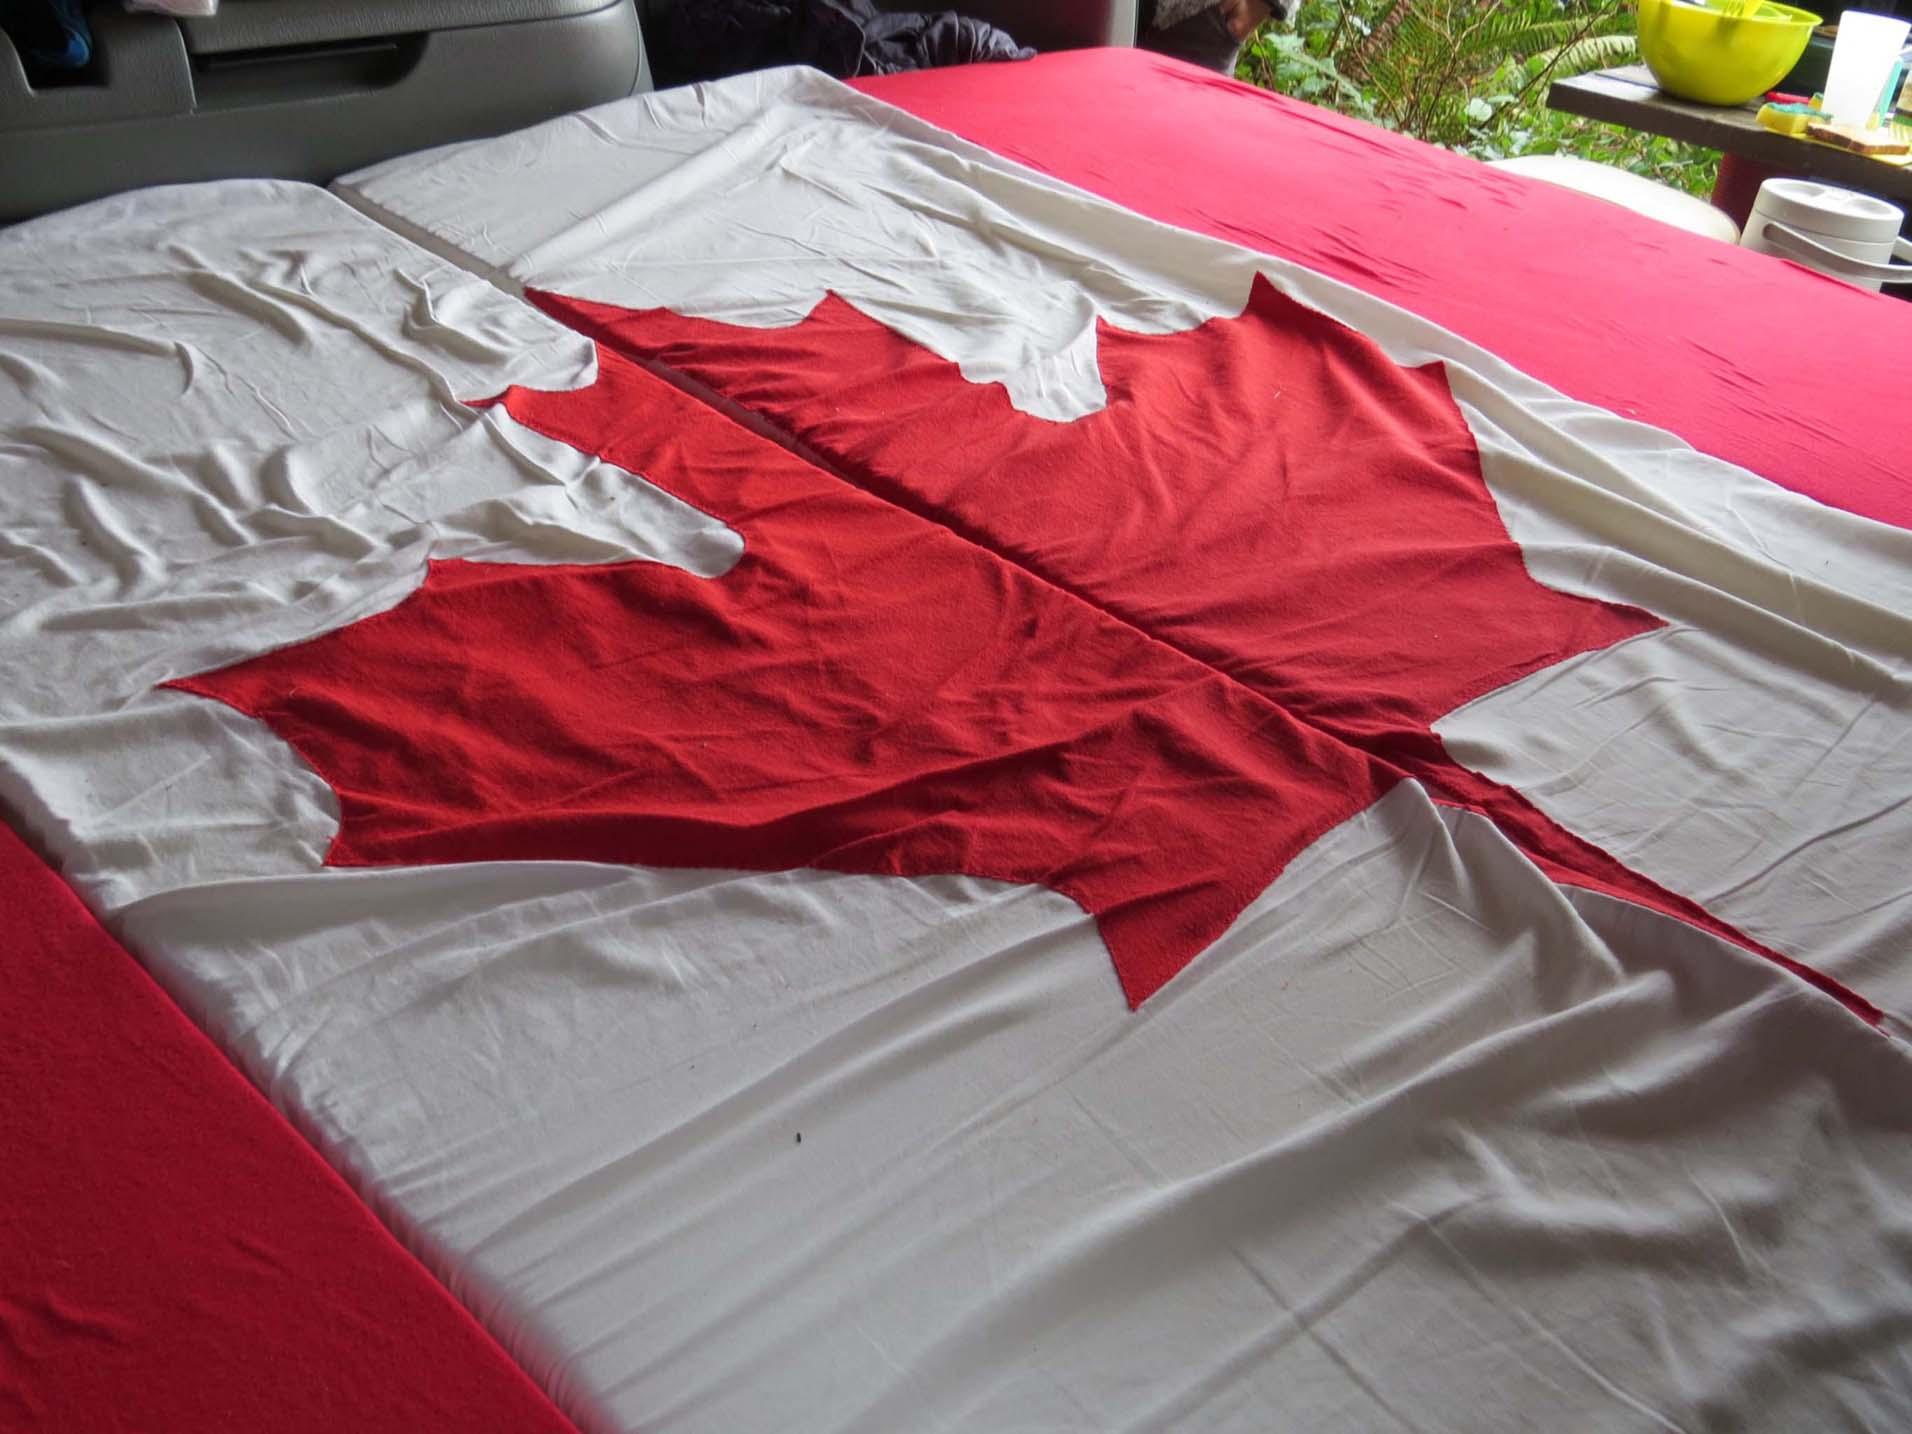 joes van plymouth grand voyager conversion mattress